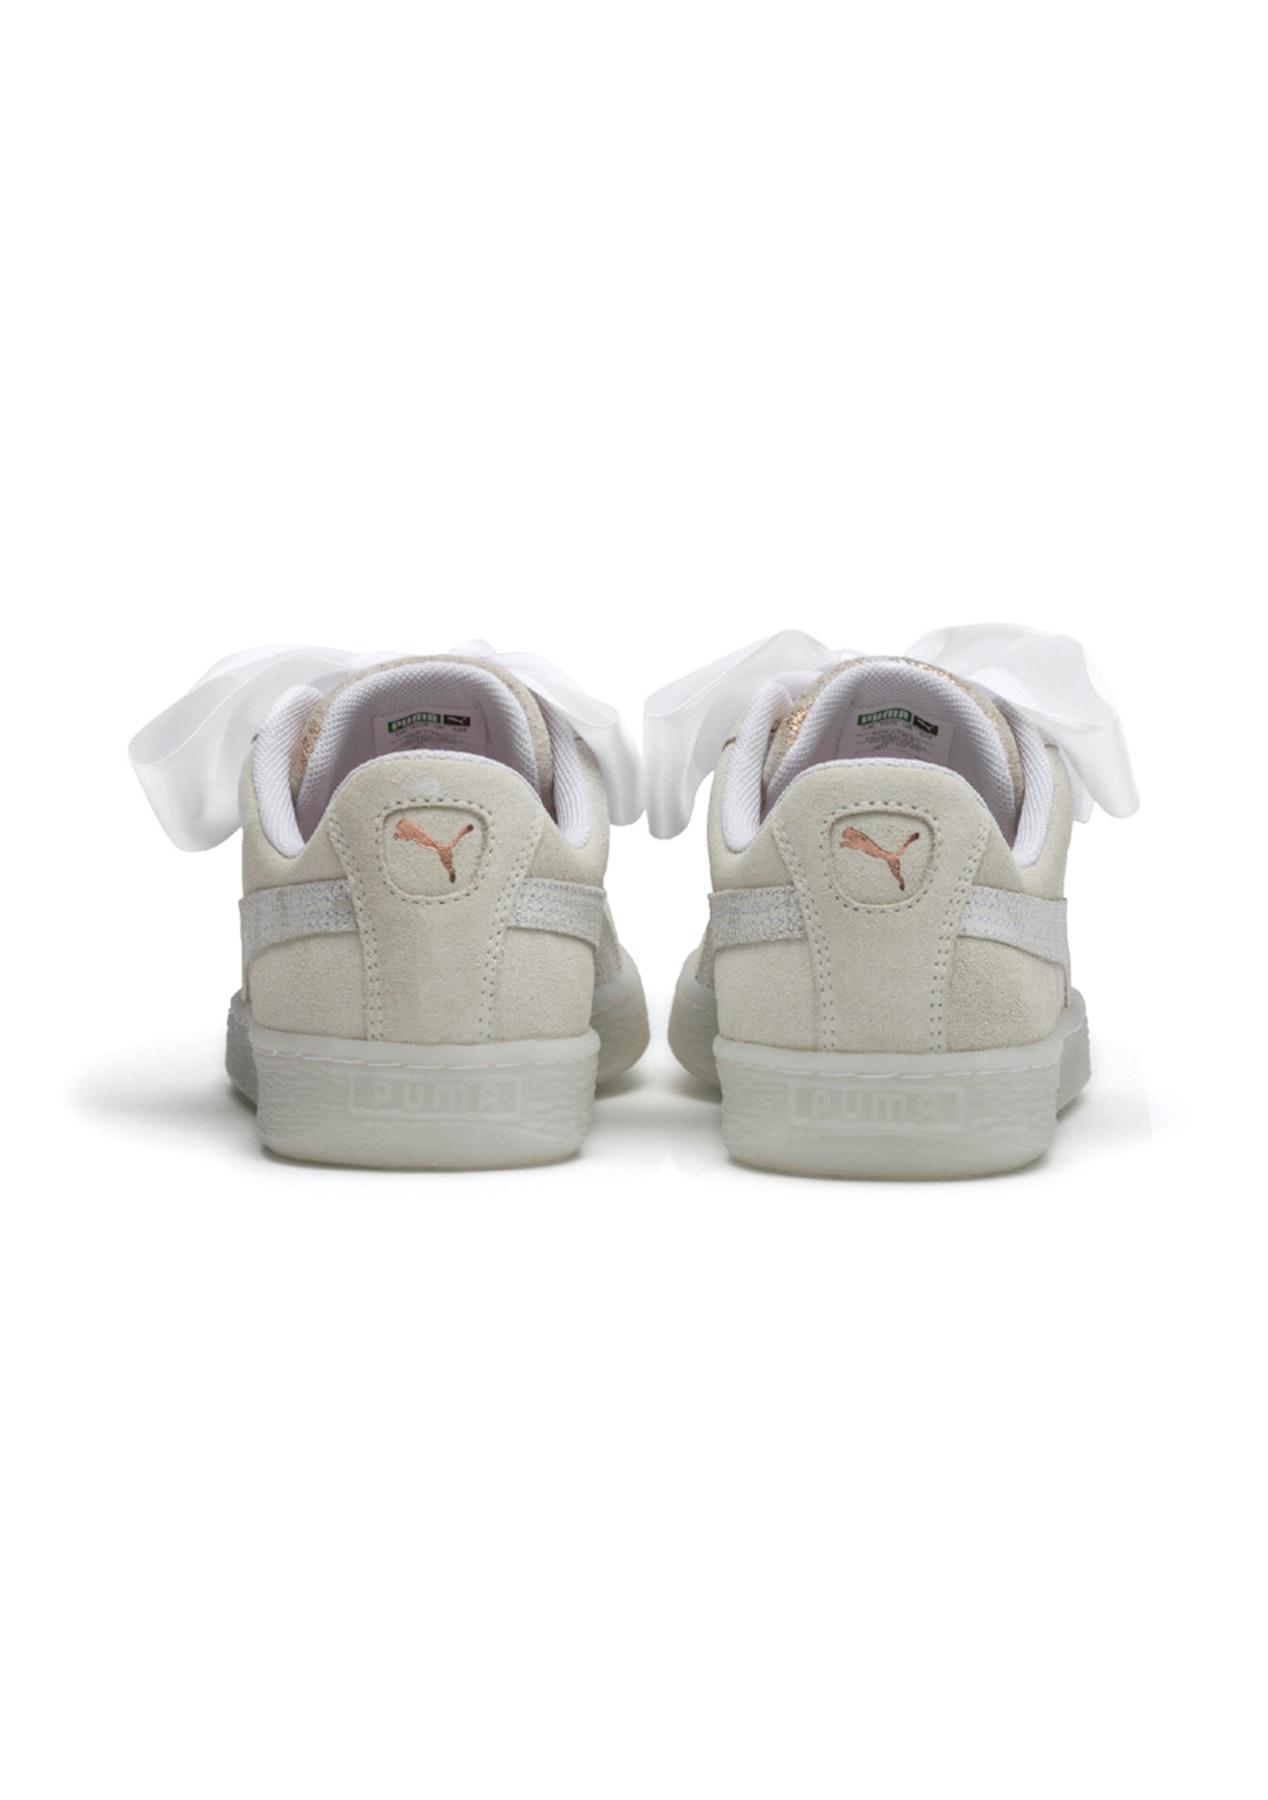 Puma - Suede Heart Artica White - Womens - PUMA Under  100 Mega Sale -  Onceit 7b35b7420